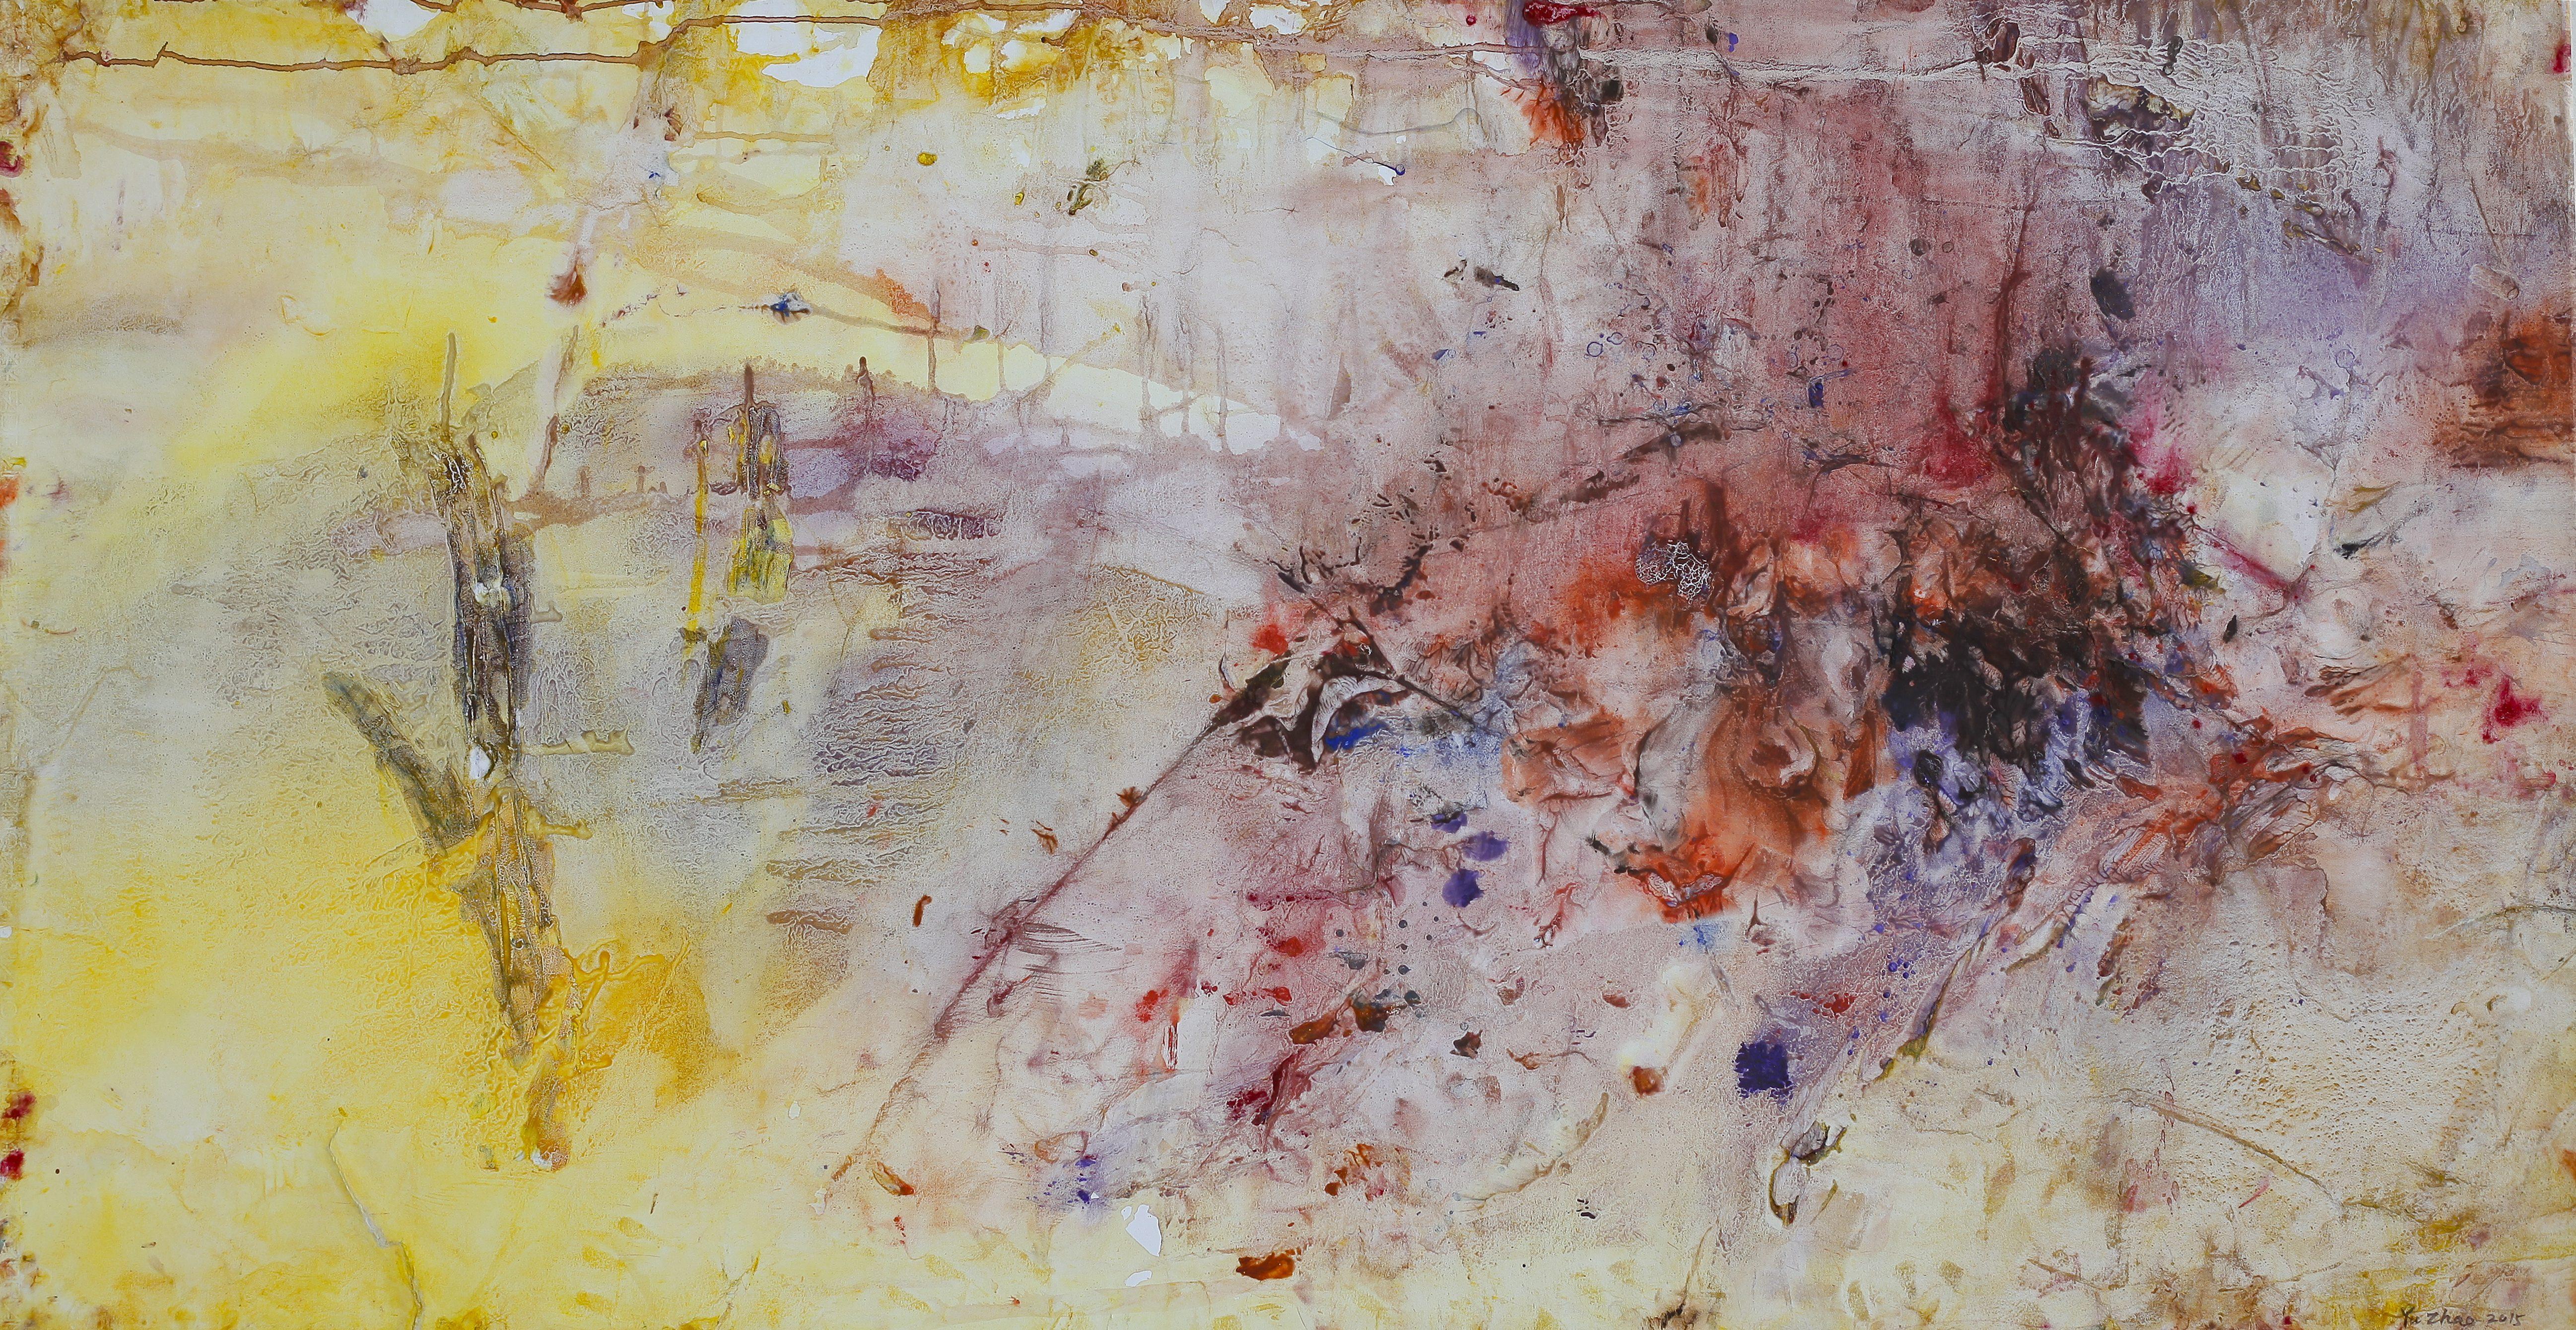 Yu Zhao, Venetian landscape, tempera/paper/canvas, 150x75cm, 2017